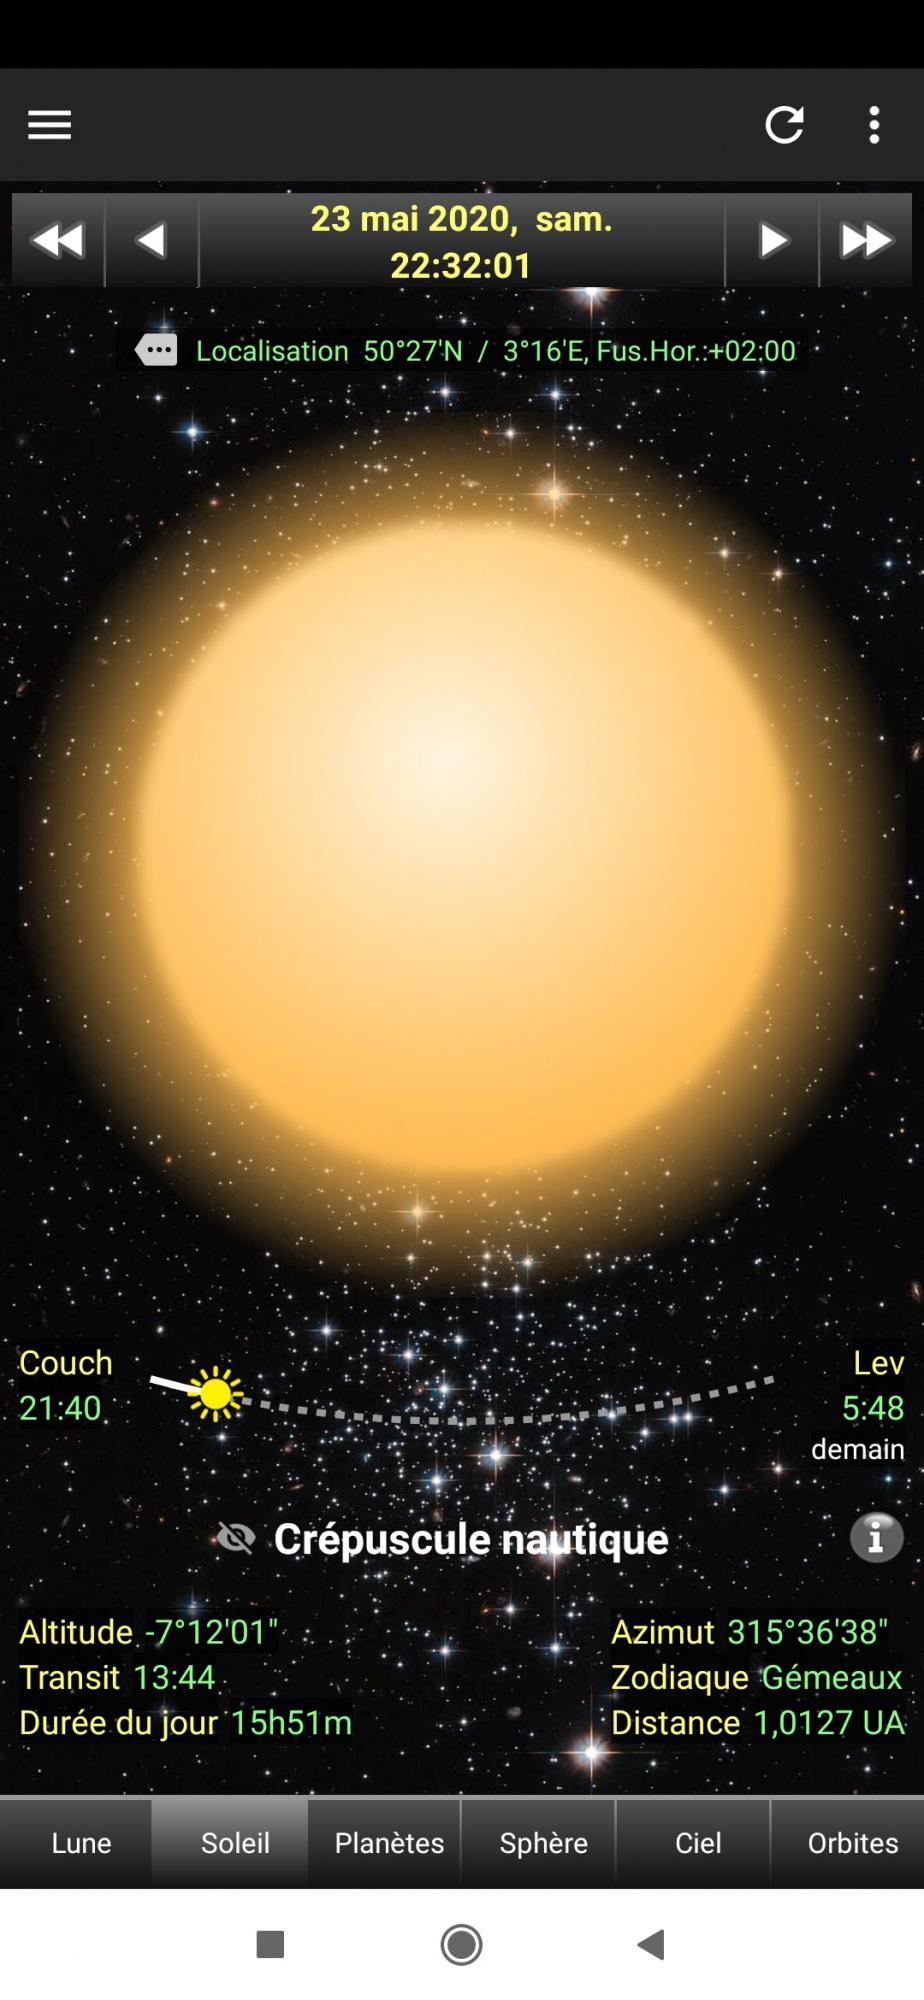 Screenshot_2020-05-23-22-32-30-044_com.dafftin.android.moon_phase.thumb.jpg.554cdb7c984d92810b7faf7fcc990f9e.jpg